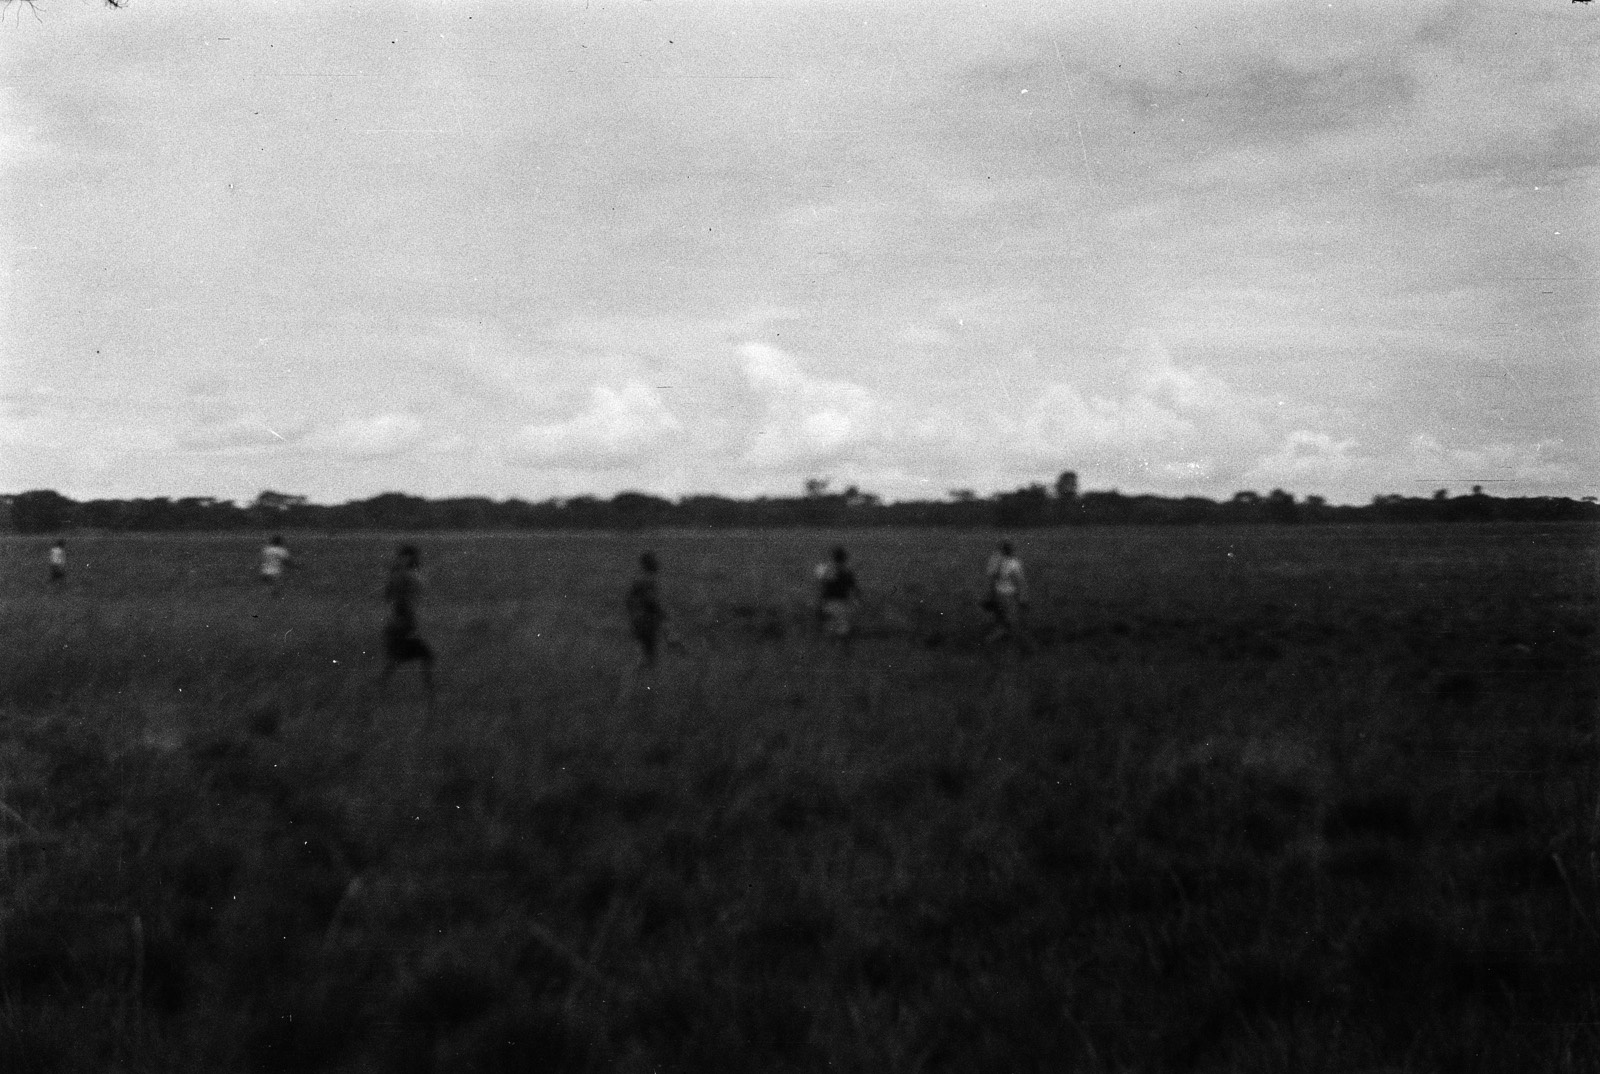 Н'Чанга. Группа мужчин пересекает дамбо